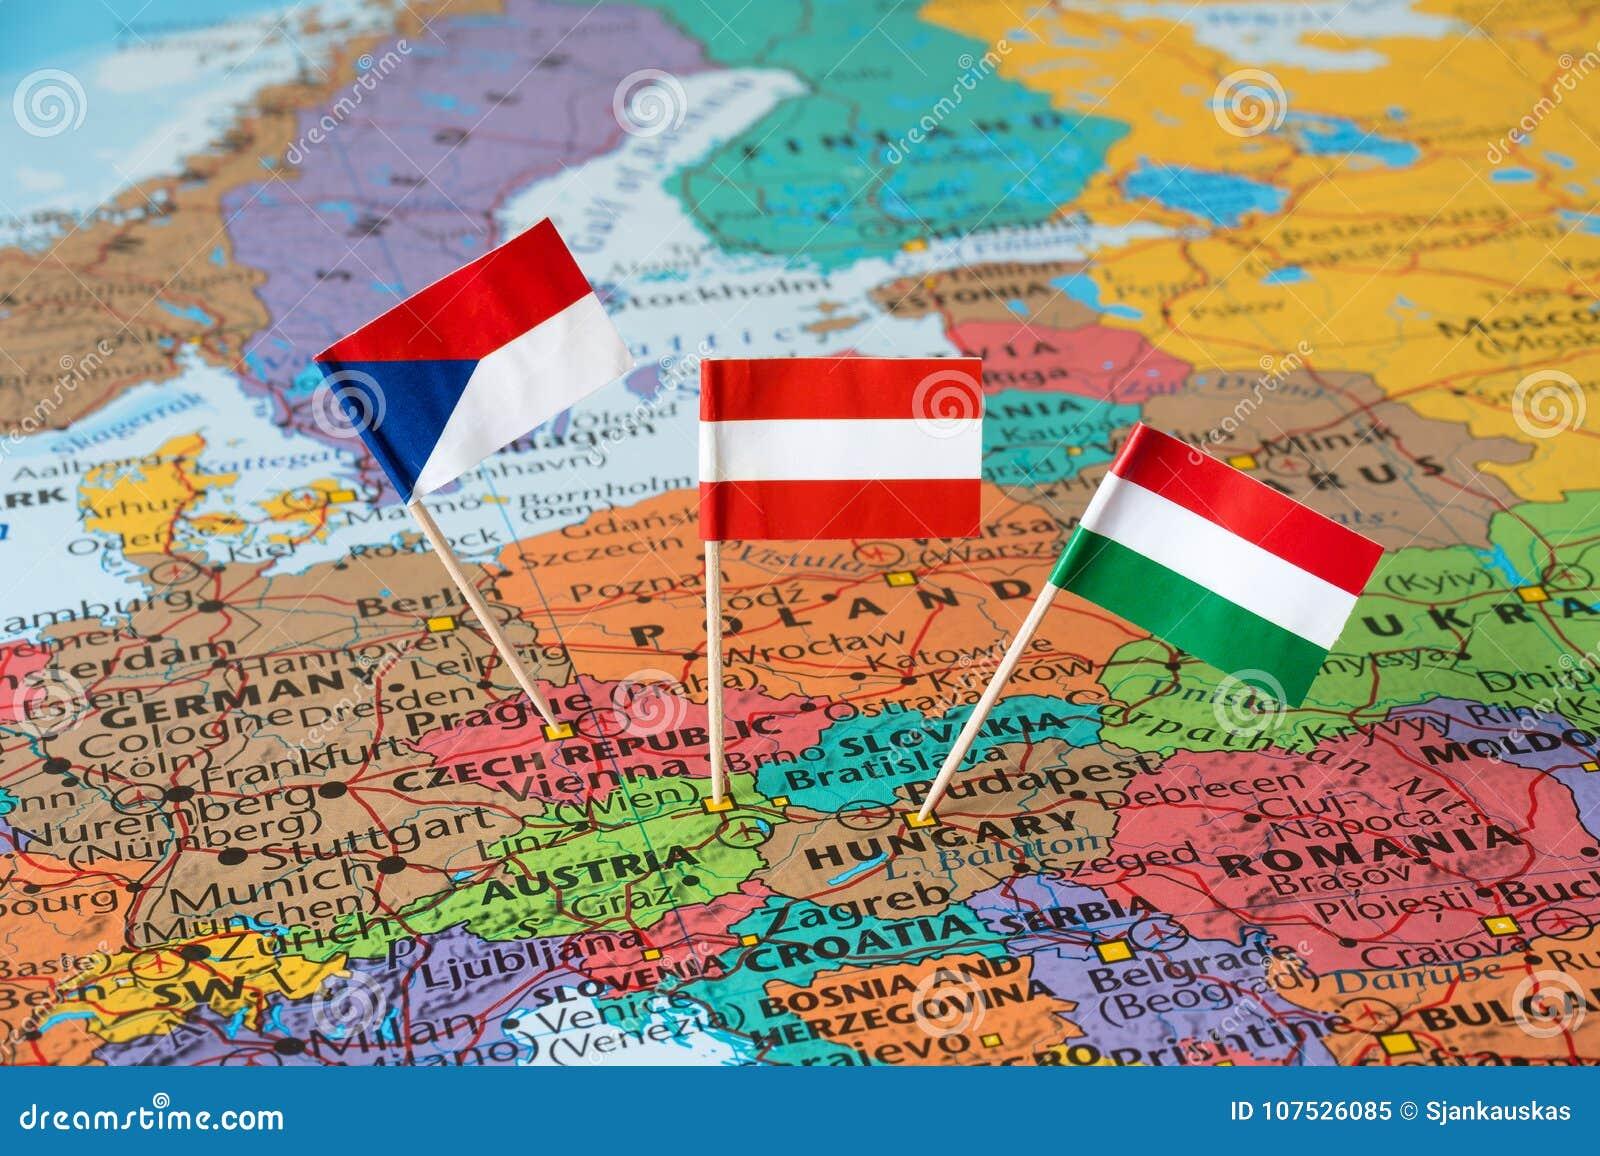 Austria, Czech Republic, Hungary Flag Pins, Central Europe Map Stock ...